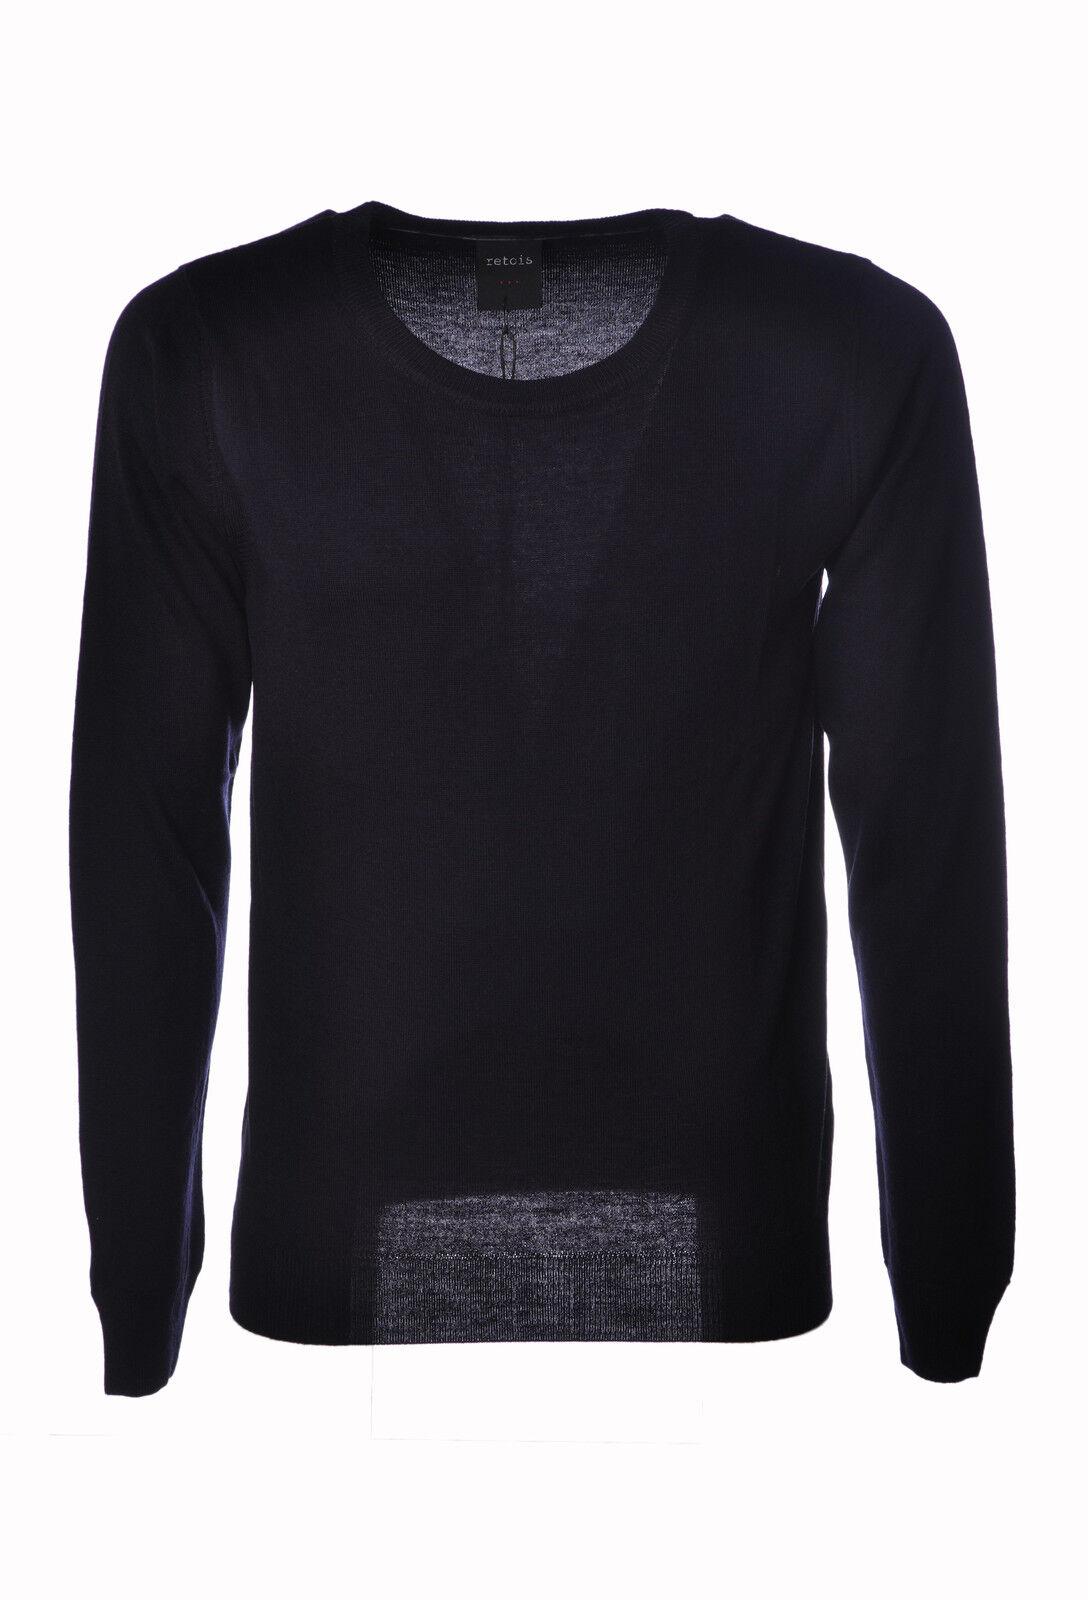 Retois  -  Sweaters - Male - Blau - 3861630A184109